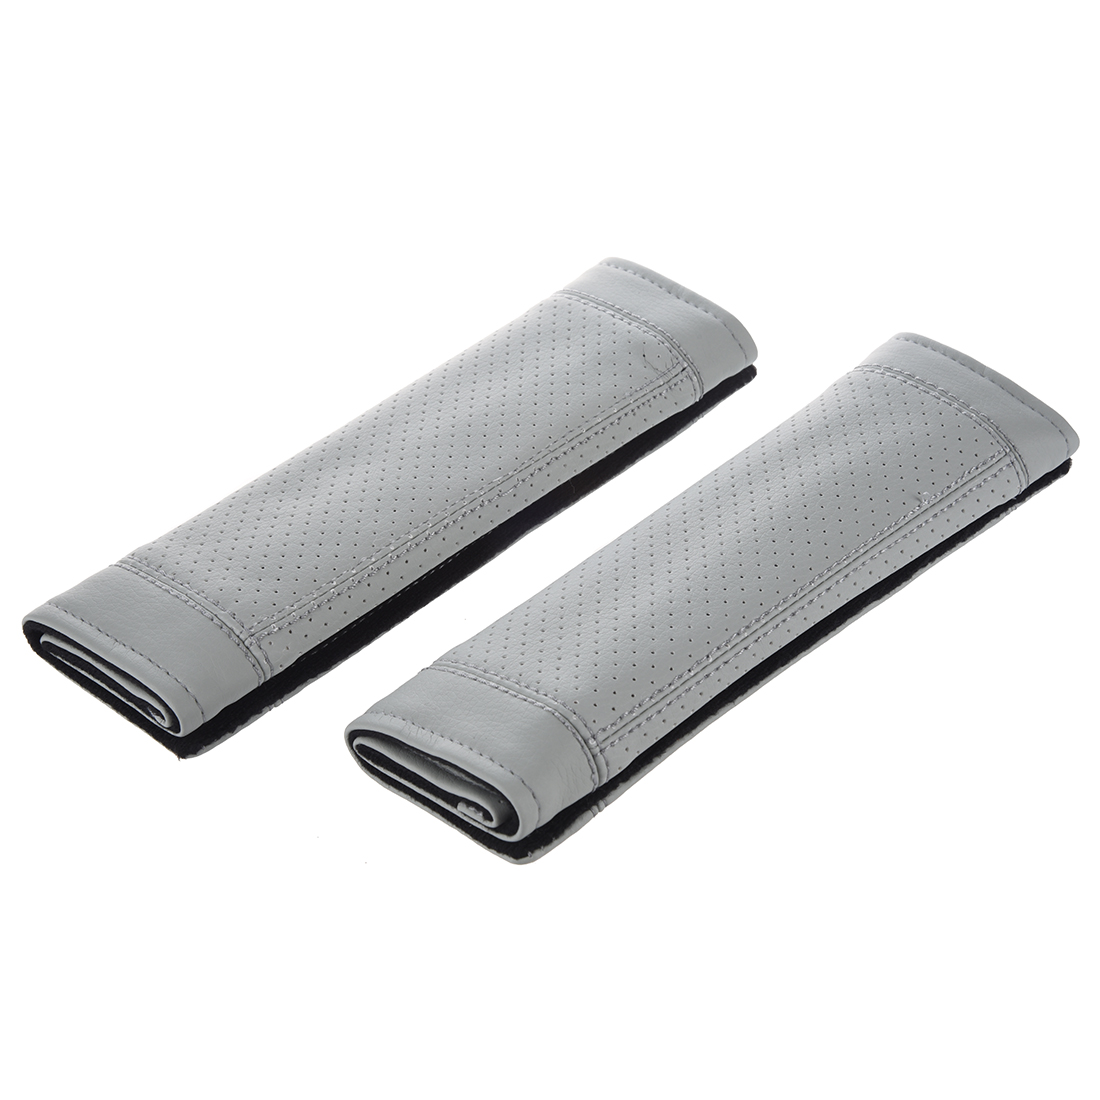 2Pcs PU Leather Car Seat Belt Shoulder pads Cover gray